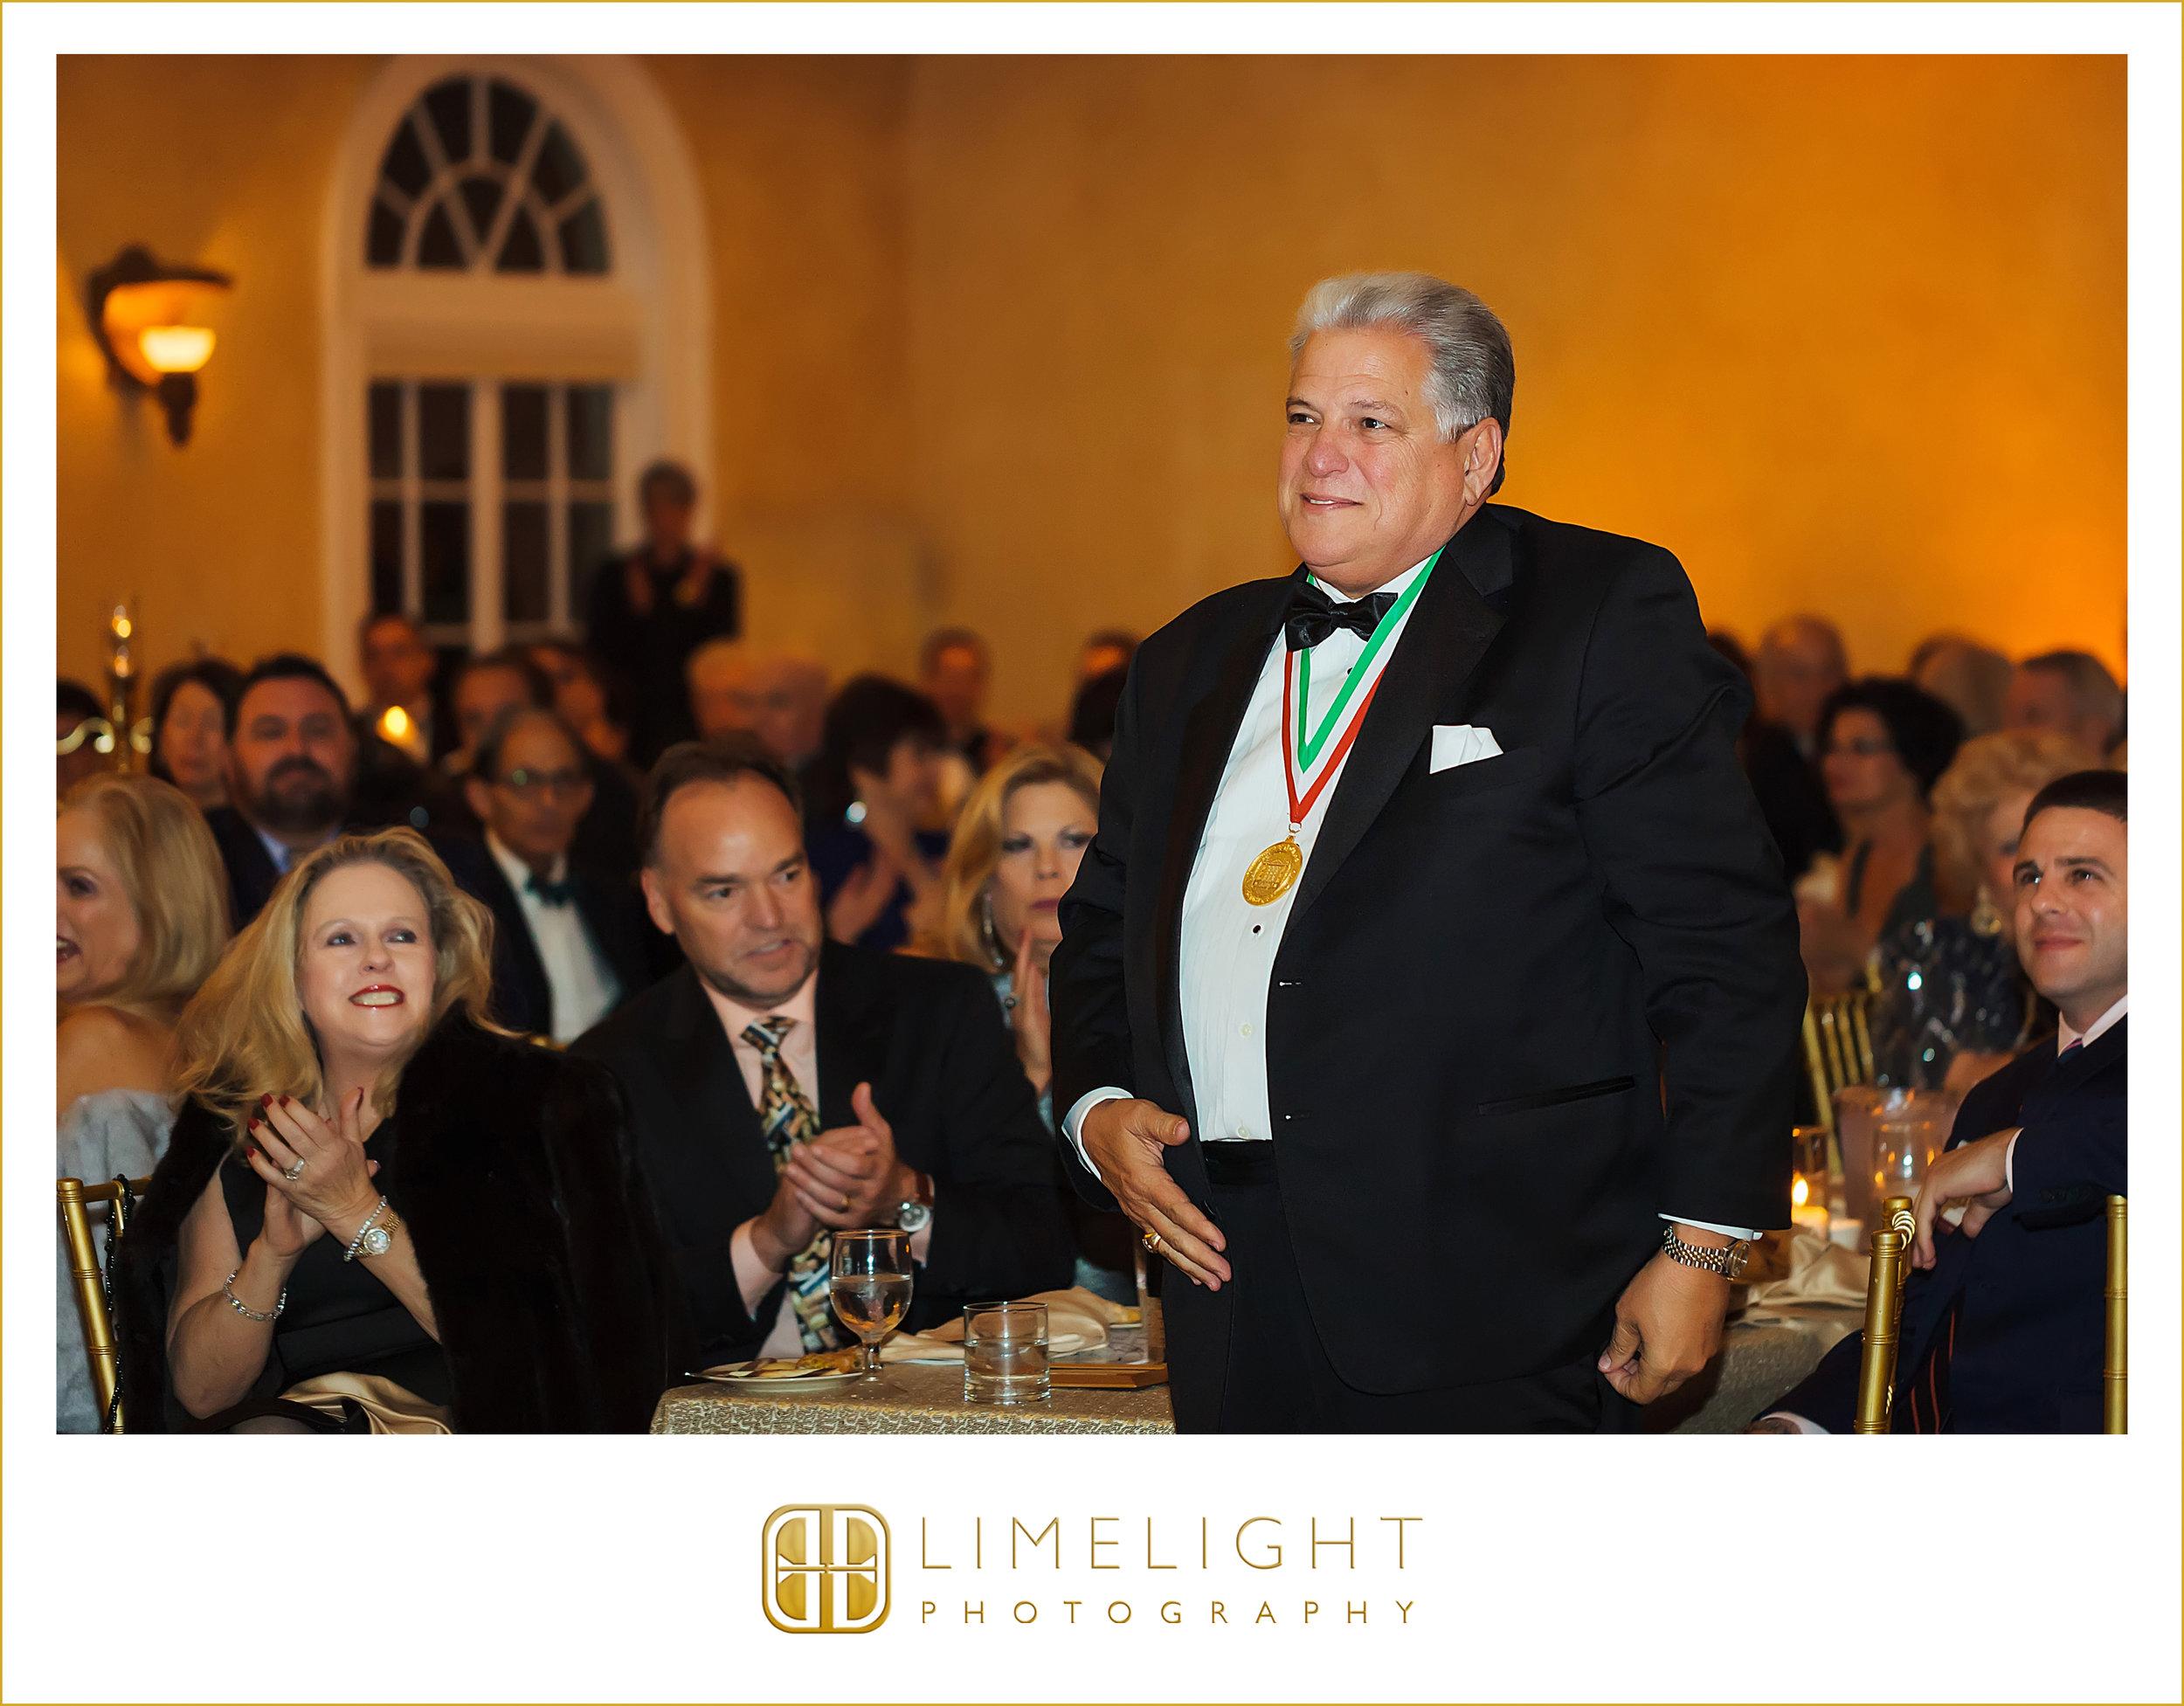 The Italian Club | Speaker | Celebration